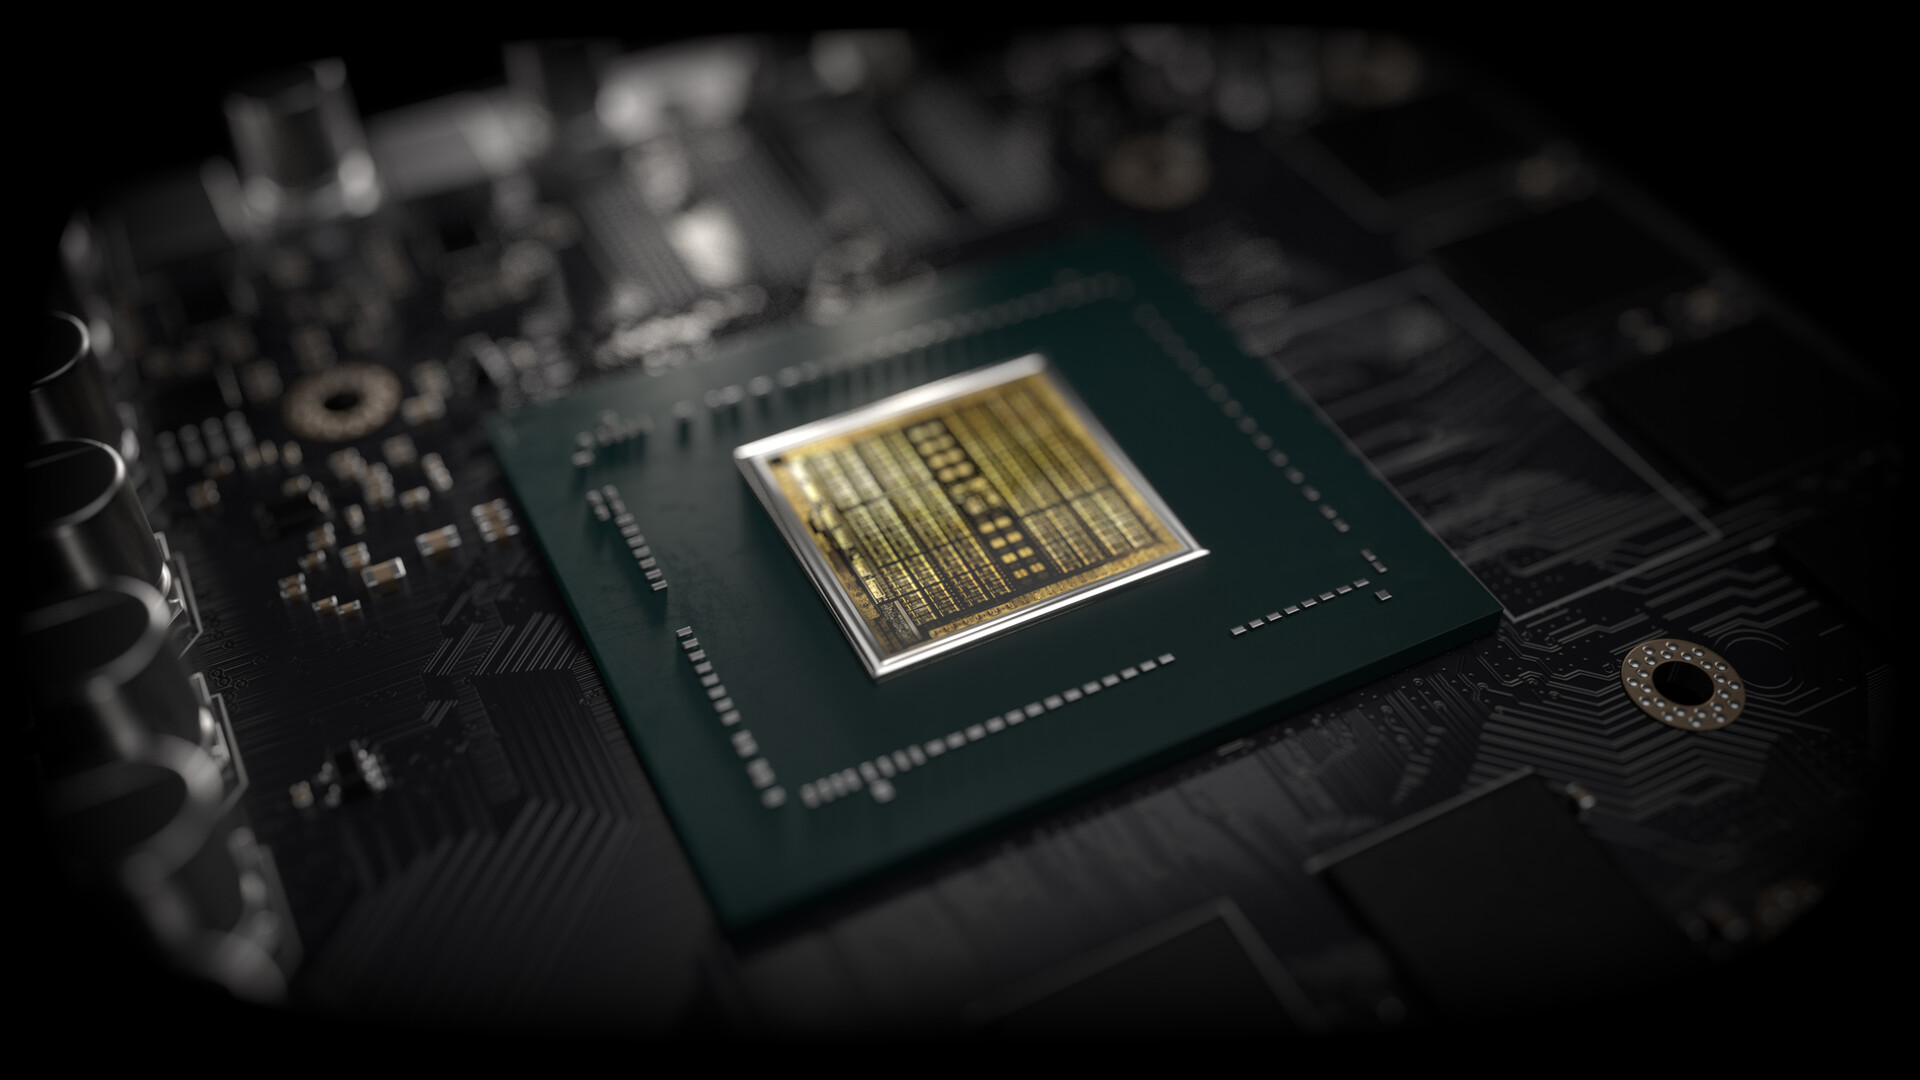 Csm nvidia rtx 2070 super mobile benchmarks a48a0e47fc